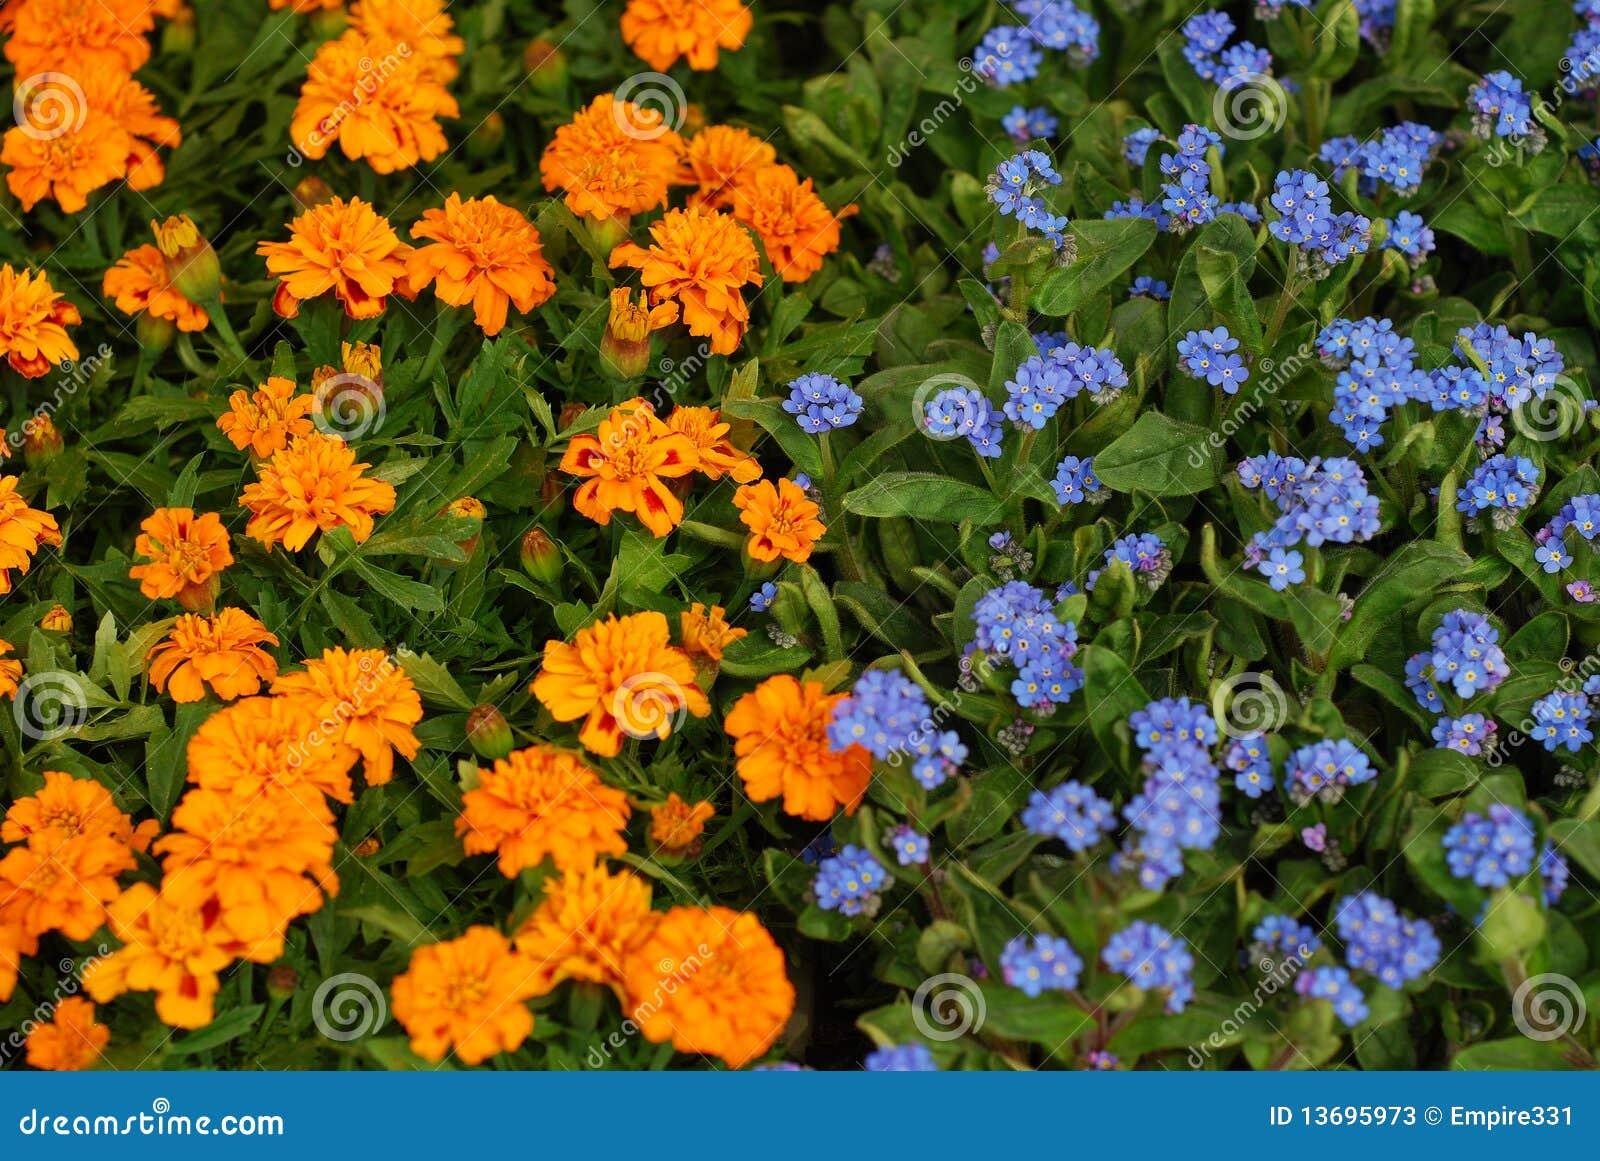 Orange And Blue Flowers Stock Photos - Image: 13695973